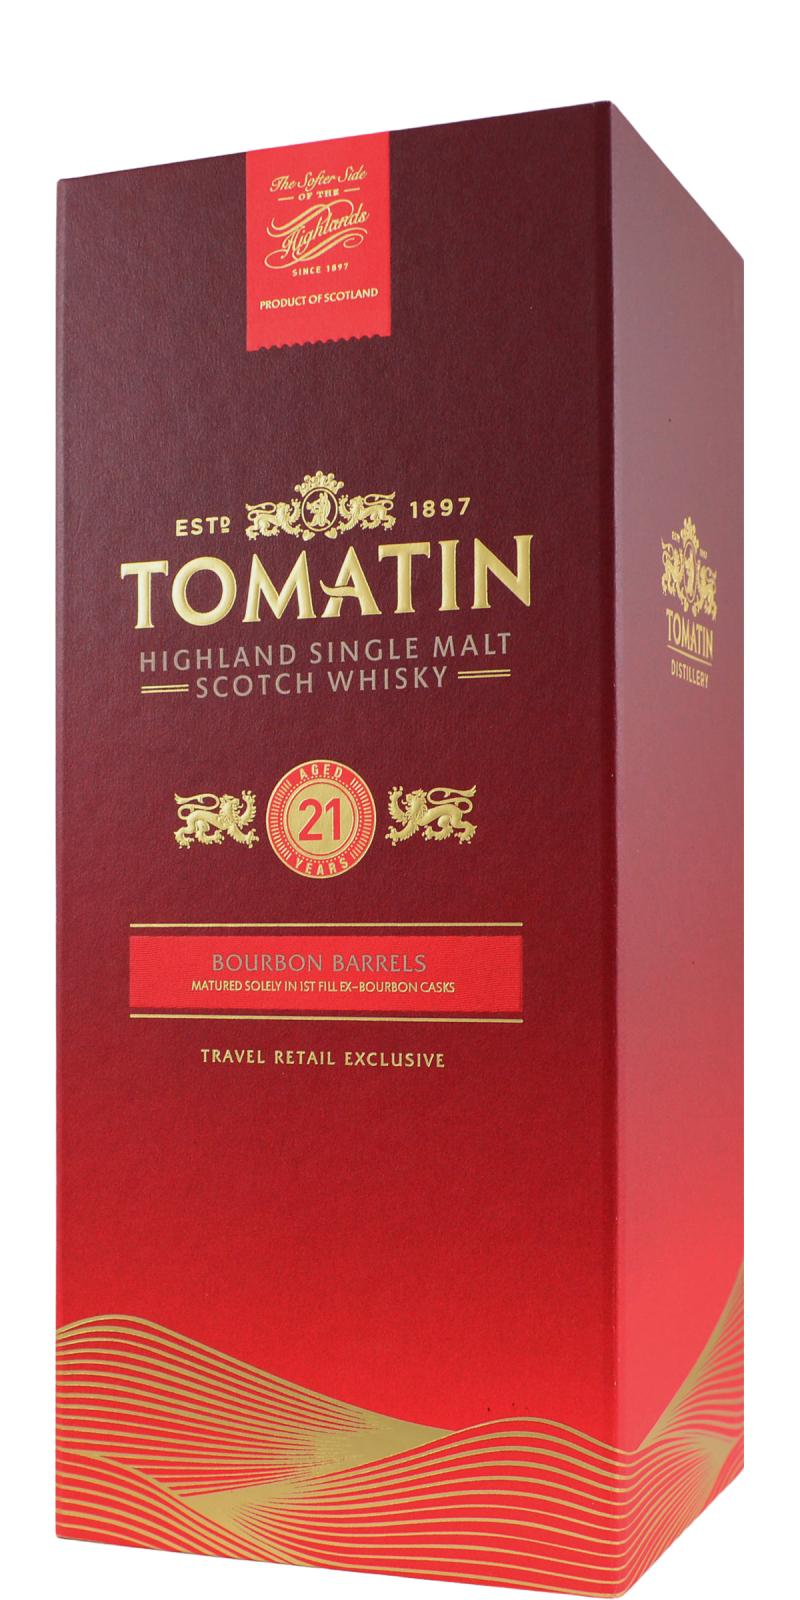 Tomatin 21-year-old